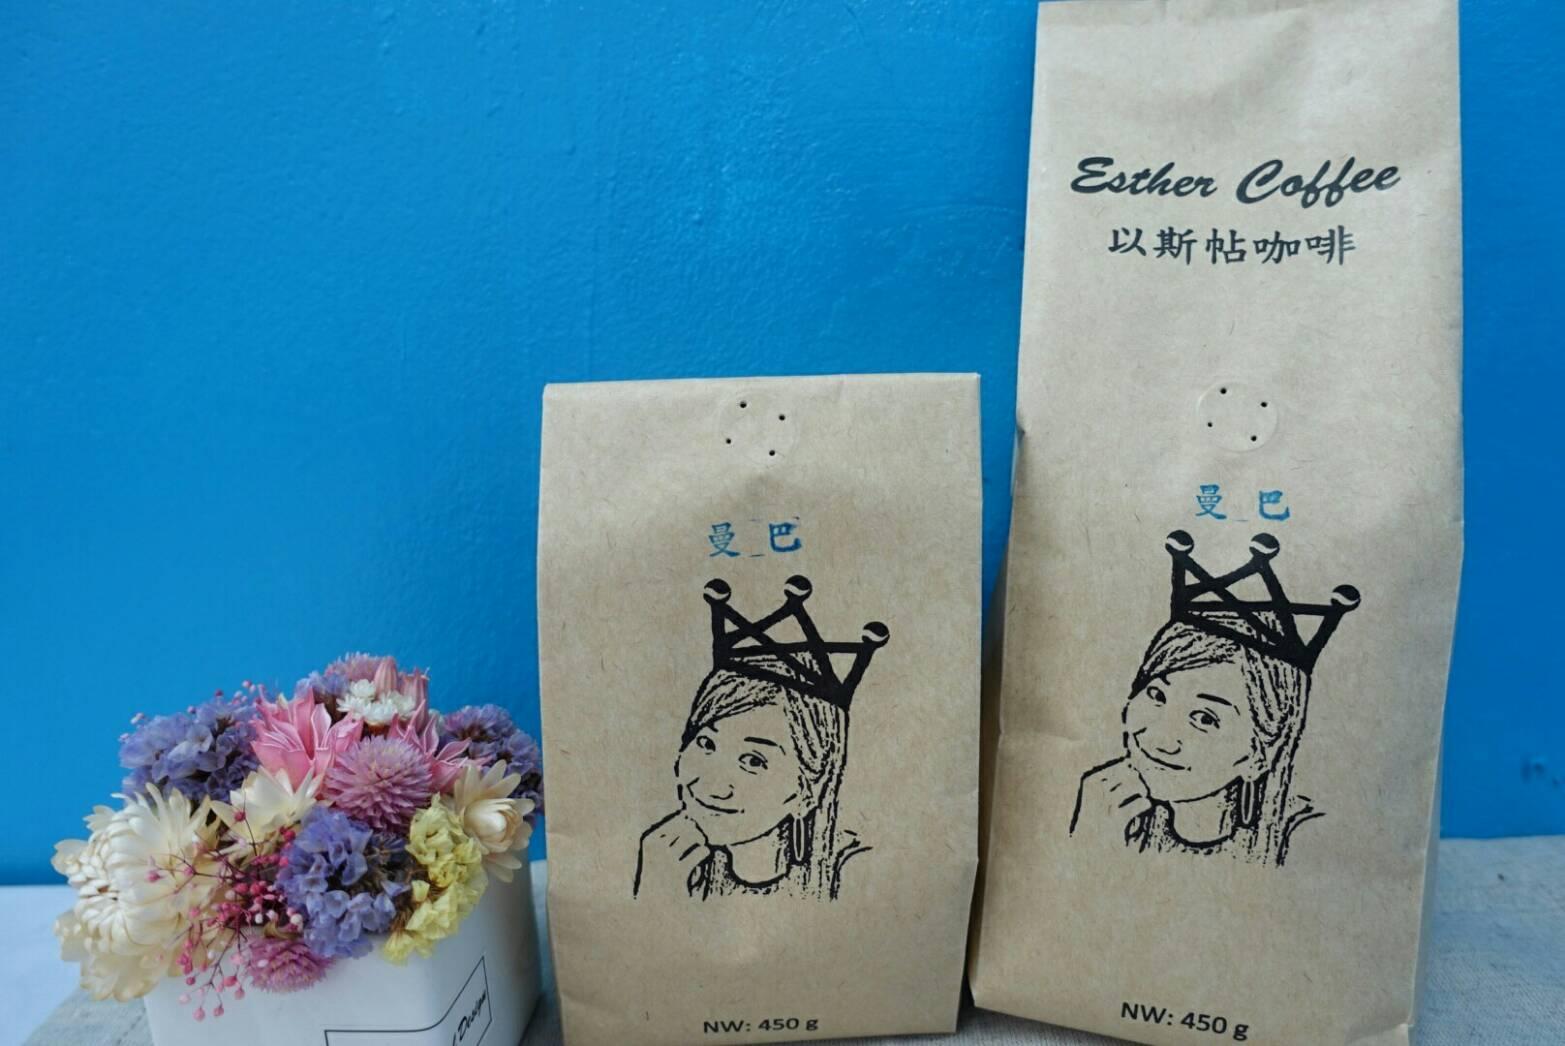 <br/><br/> 【以斯帖咖啡】曼巴--苦中為酸口感-咖啡豆-推薦初入門者飲用(半磅)<br/><br/>